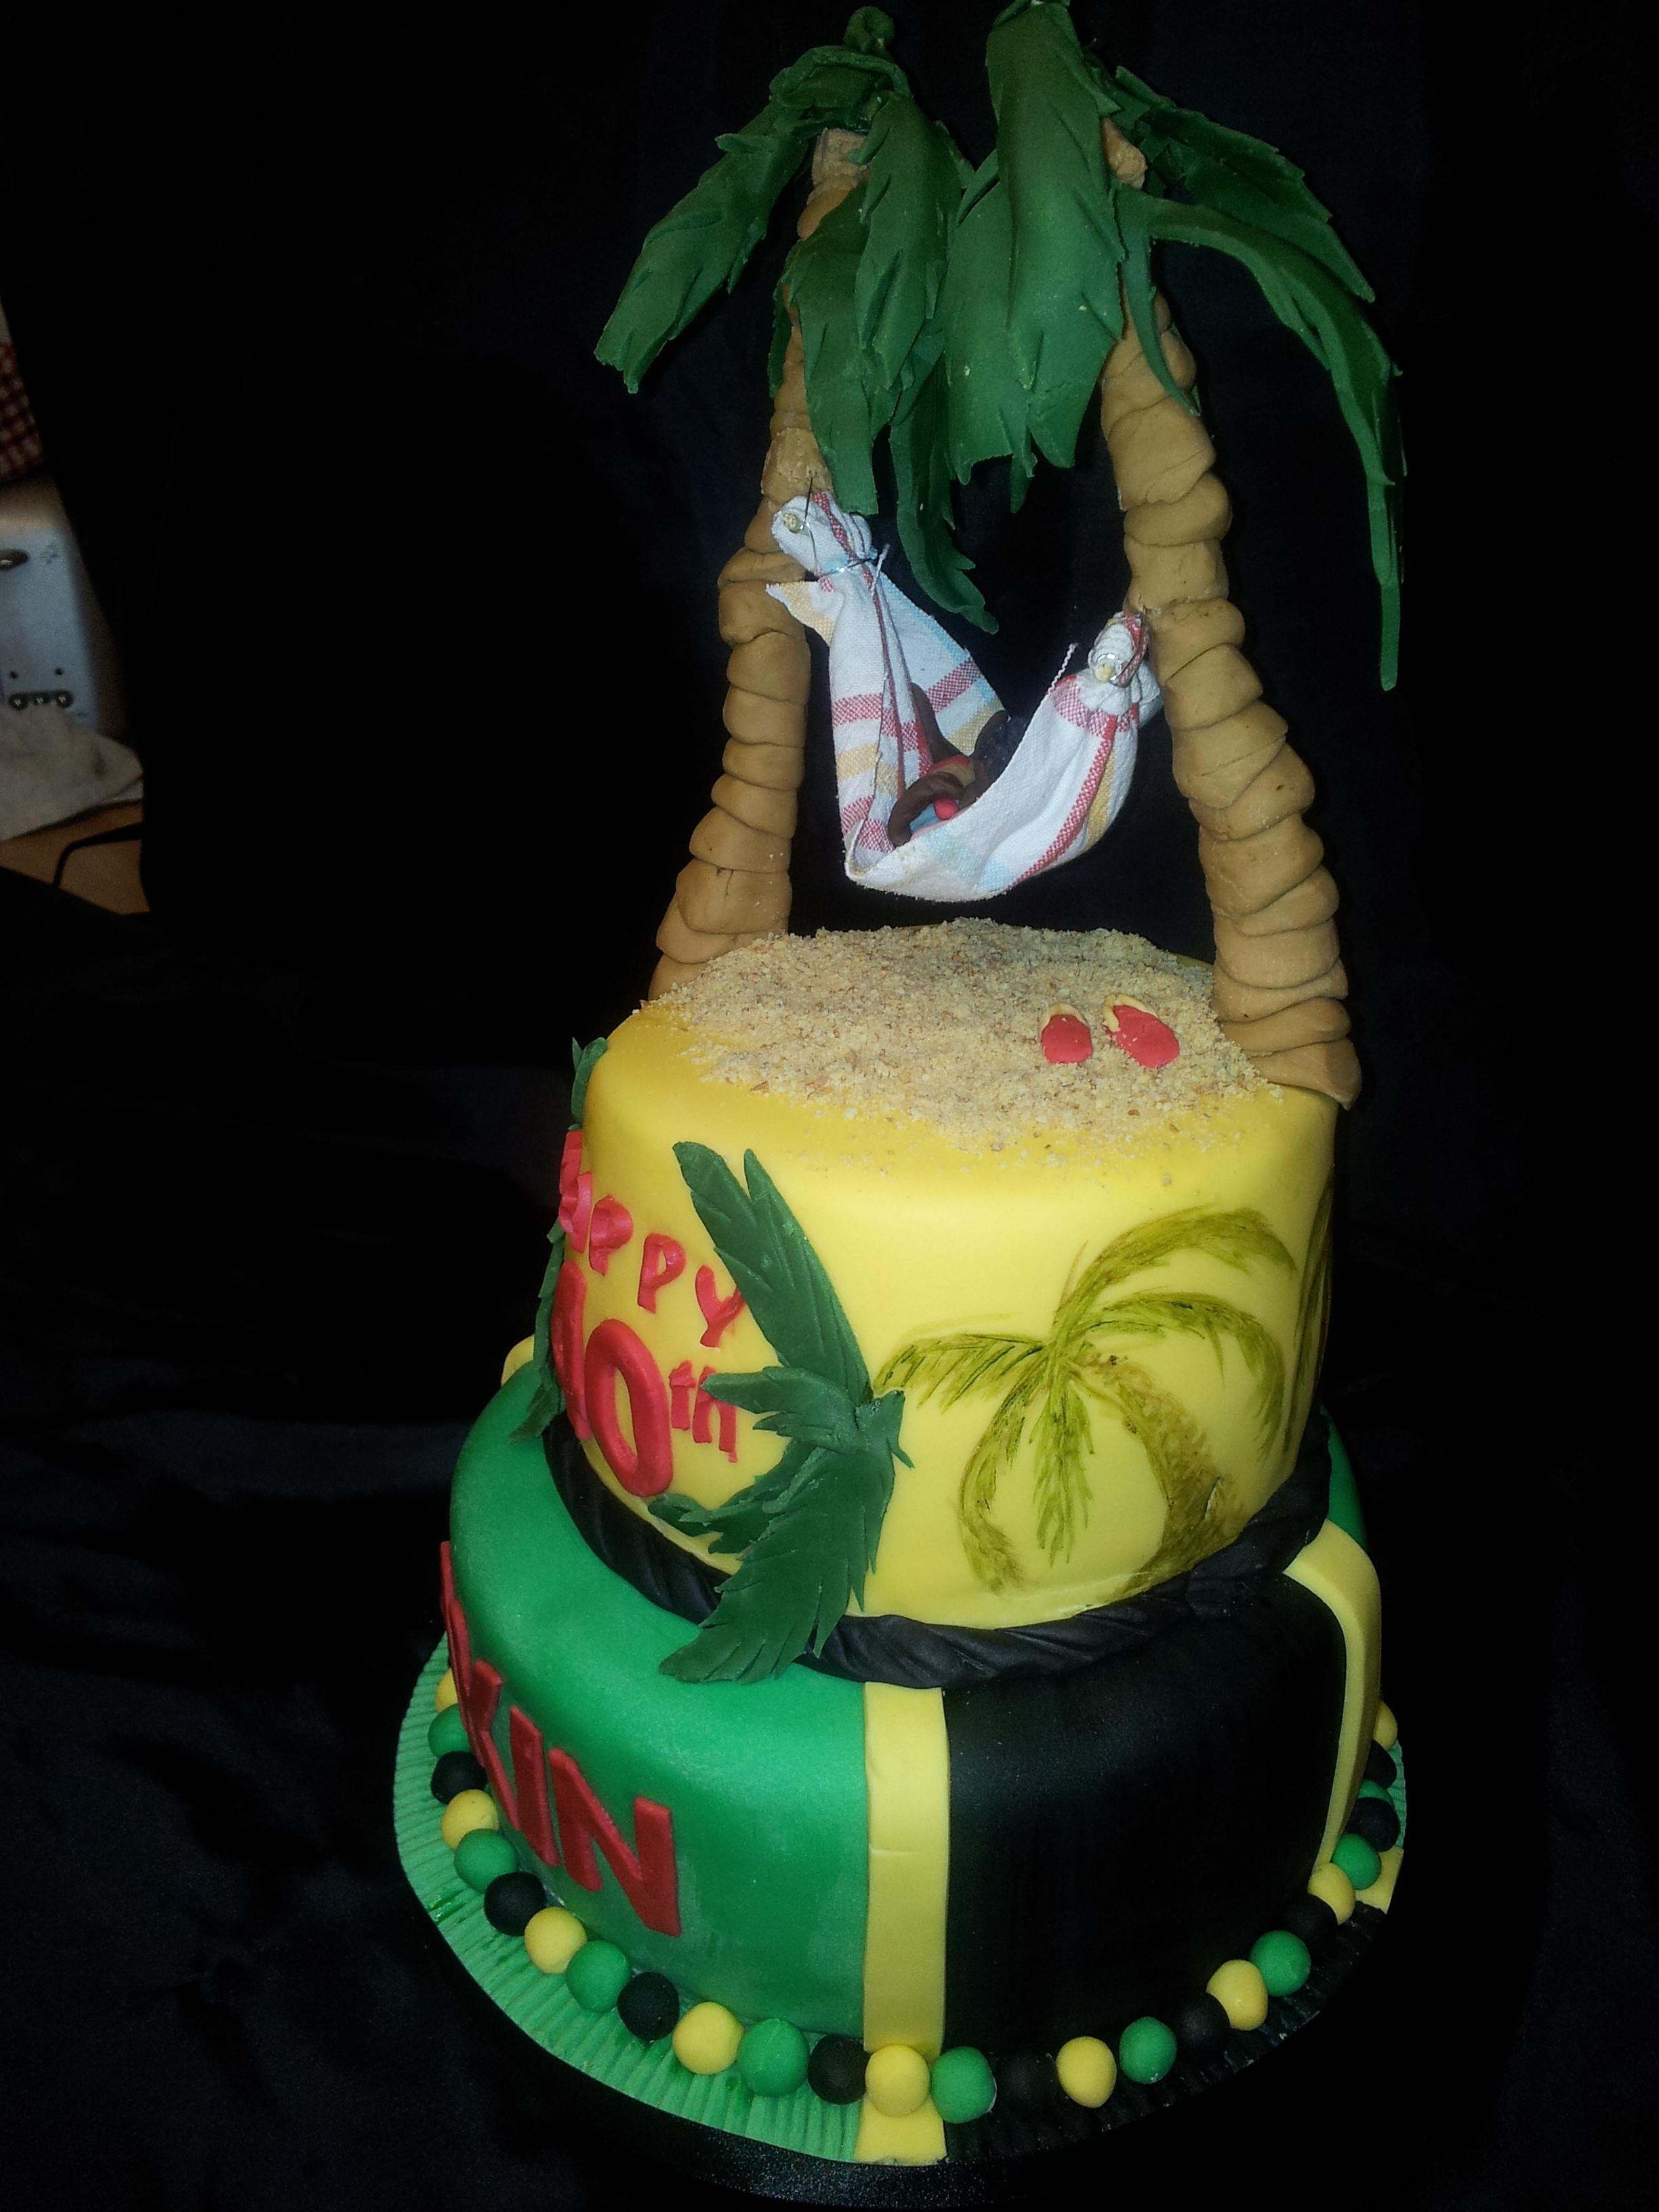 Jamaican Cake Recipes 40Th Birthday Cake, Ja...